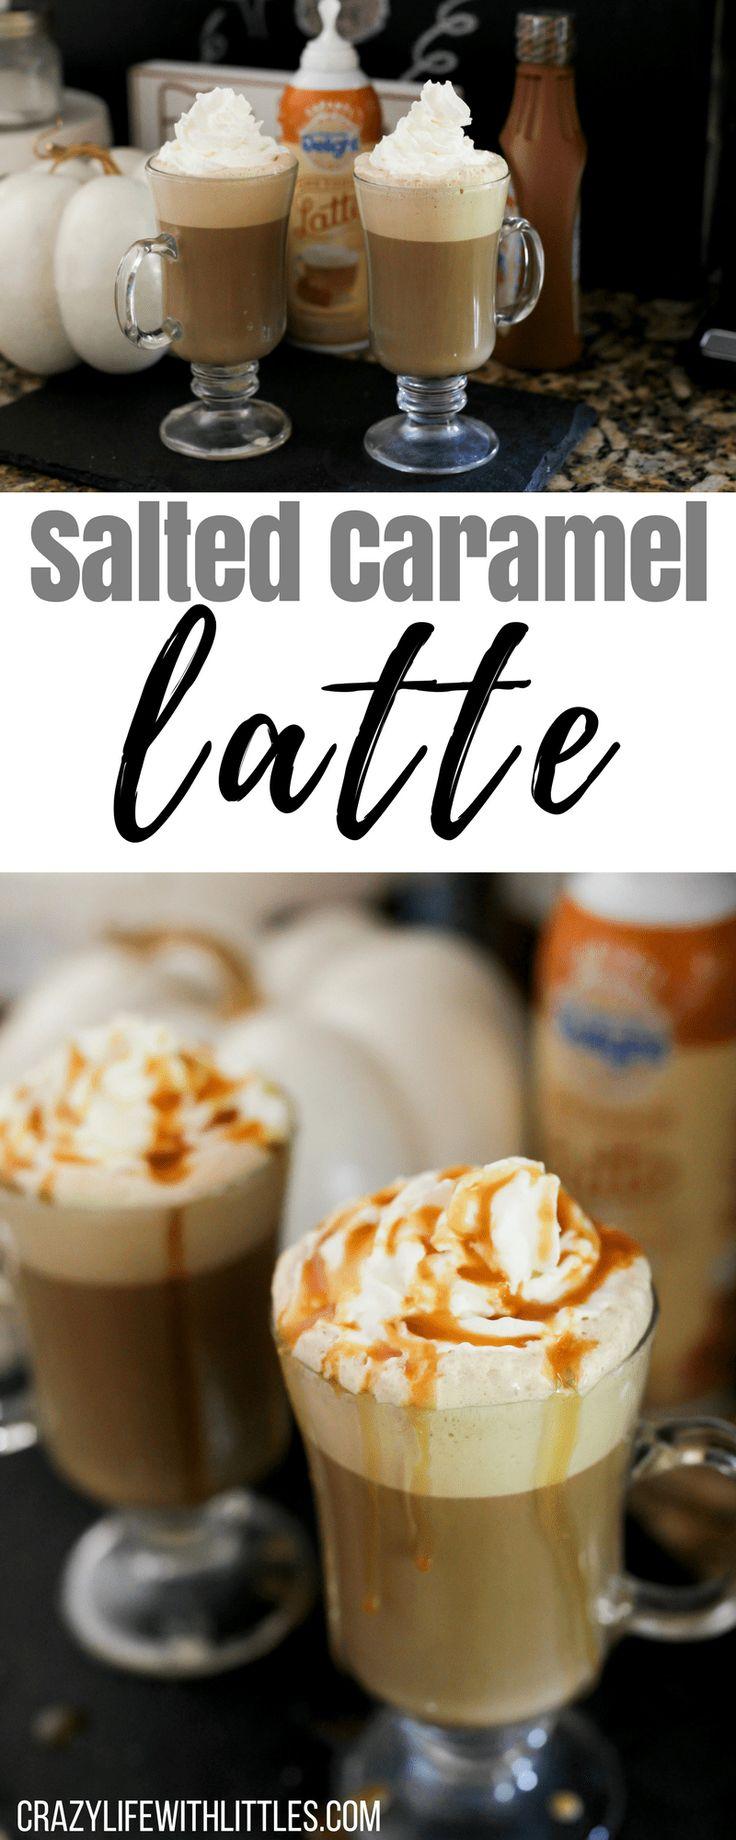 #ad #LatteMadeEasy, iced salted caramel latte recipe, salted caramel latte calories, salted caramel ground coffee, caramel mocha latte starbucks, salted caramel mocha frappuccino, salted caramel latte nescafe, skinny salted caramel mocha